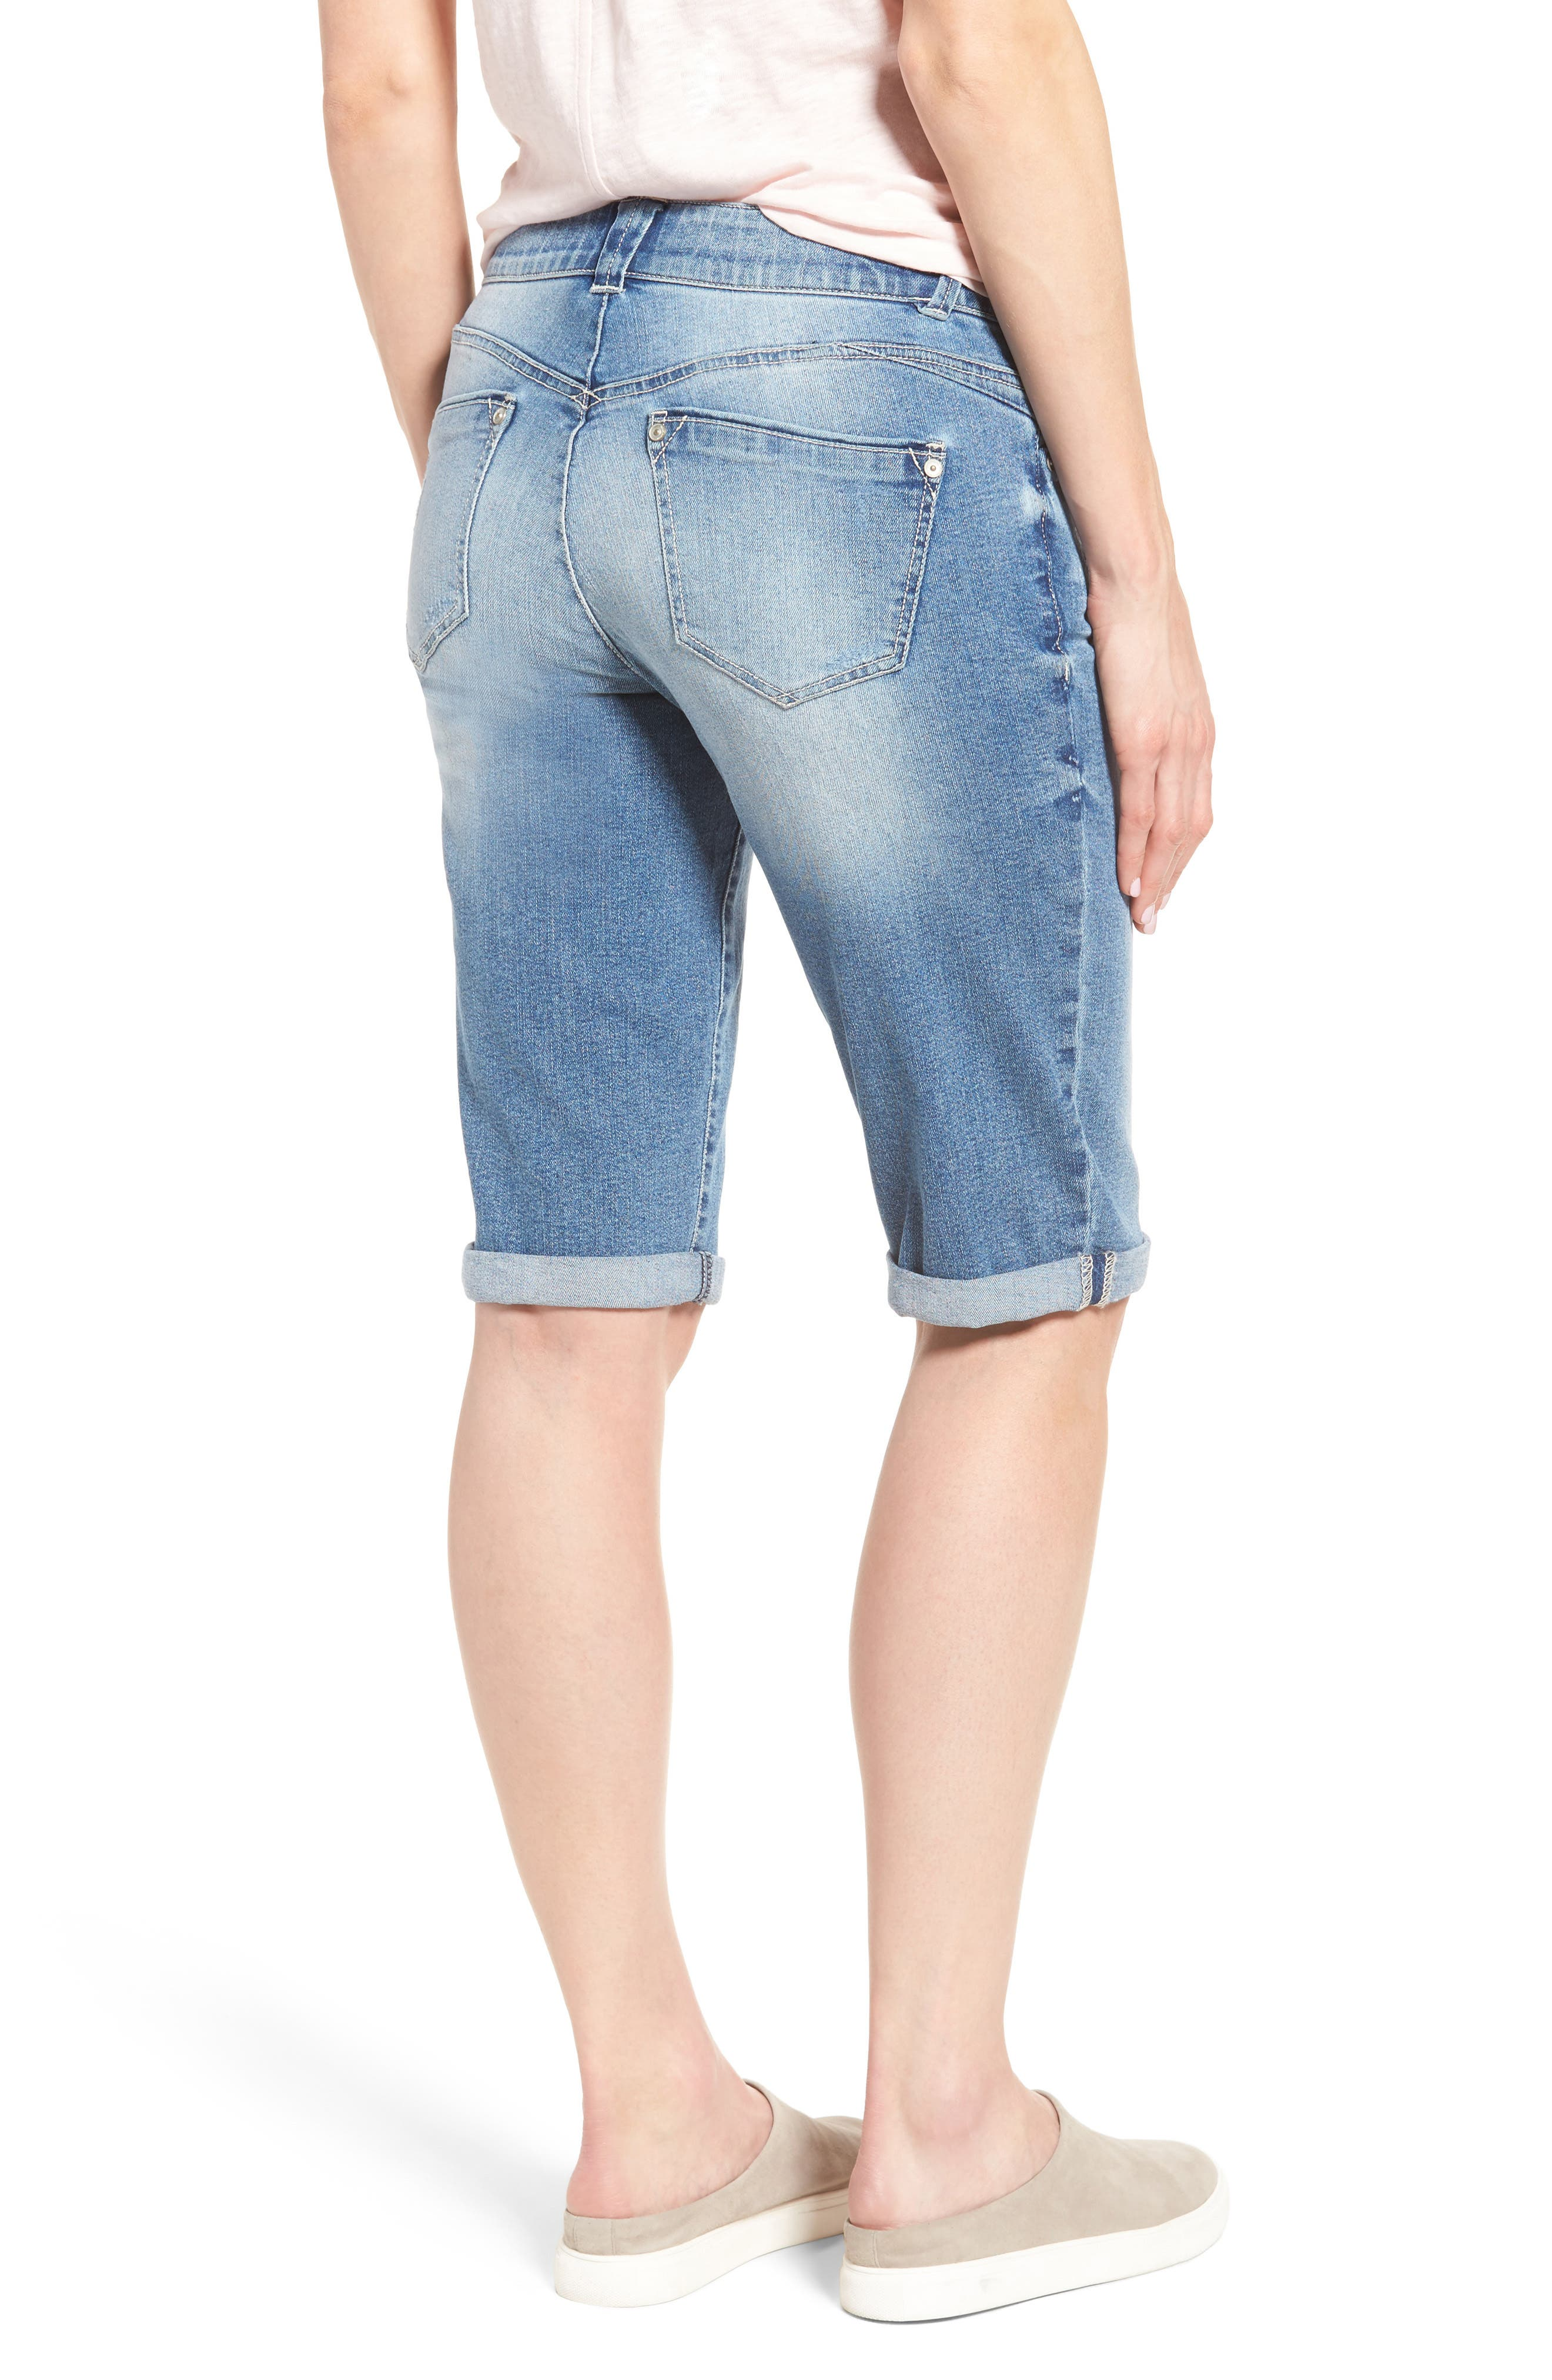 Alternate Image 2  - Wit & Wisdom Ab-solution Ripped Denim Bermuda Shorts (Regular & Petite) (Nordstrom Exclusive)